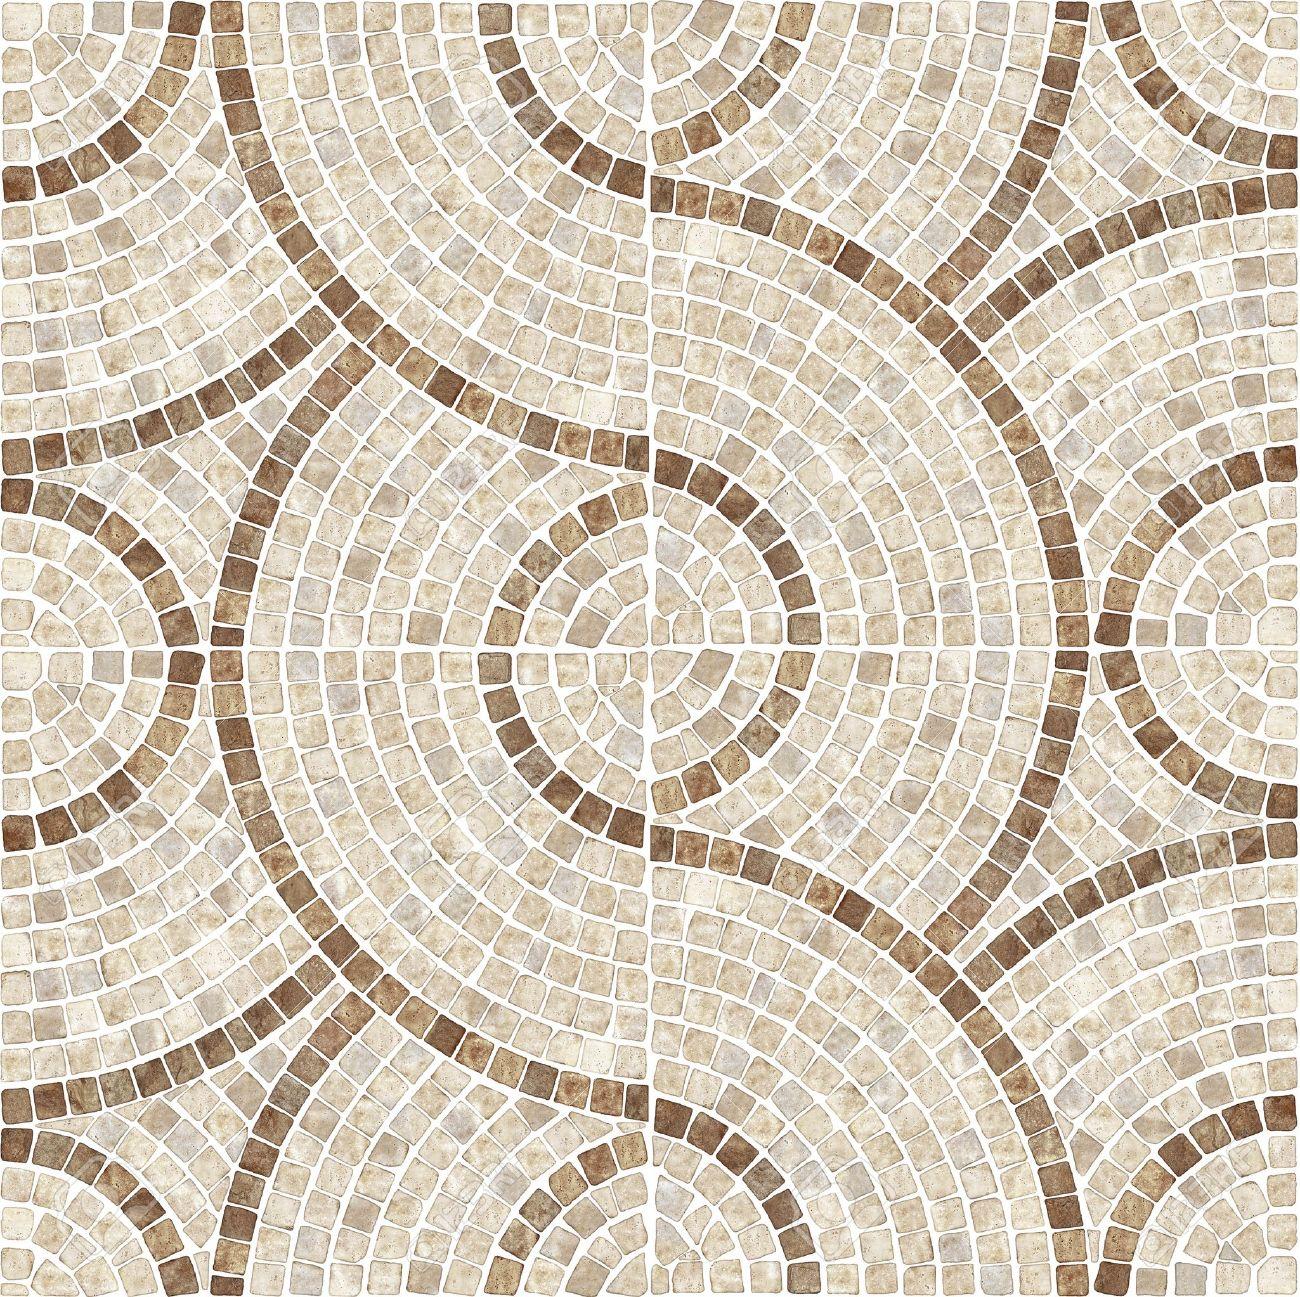 stone floor tiles texture  u003cbu003etile floor textureu003cbu003e v stone tiles texture. Floor Tiles  Add To Inquiry Cart Floor Tiles E   Imecoo co